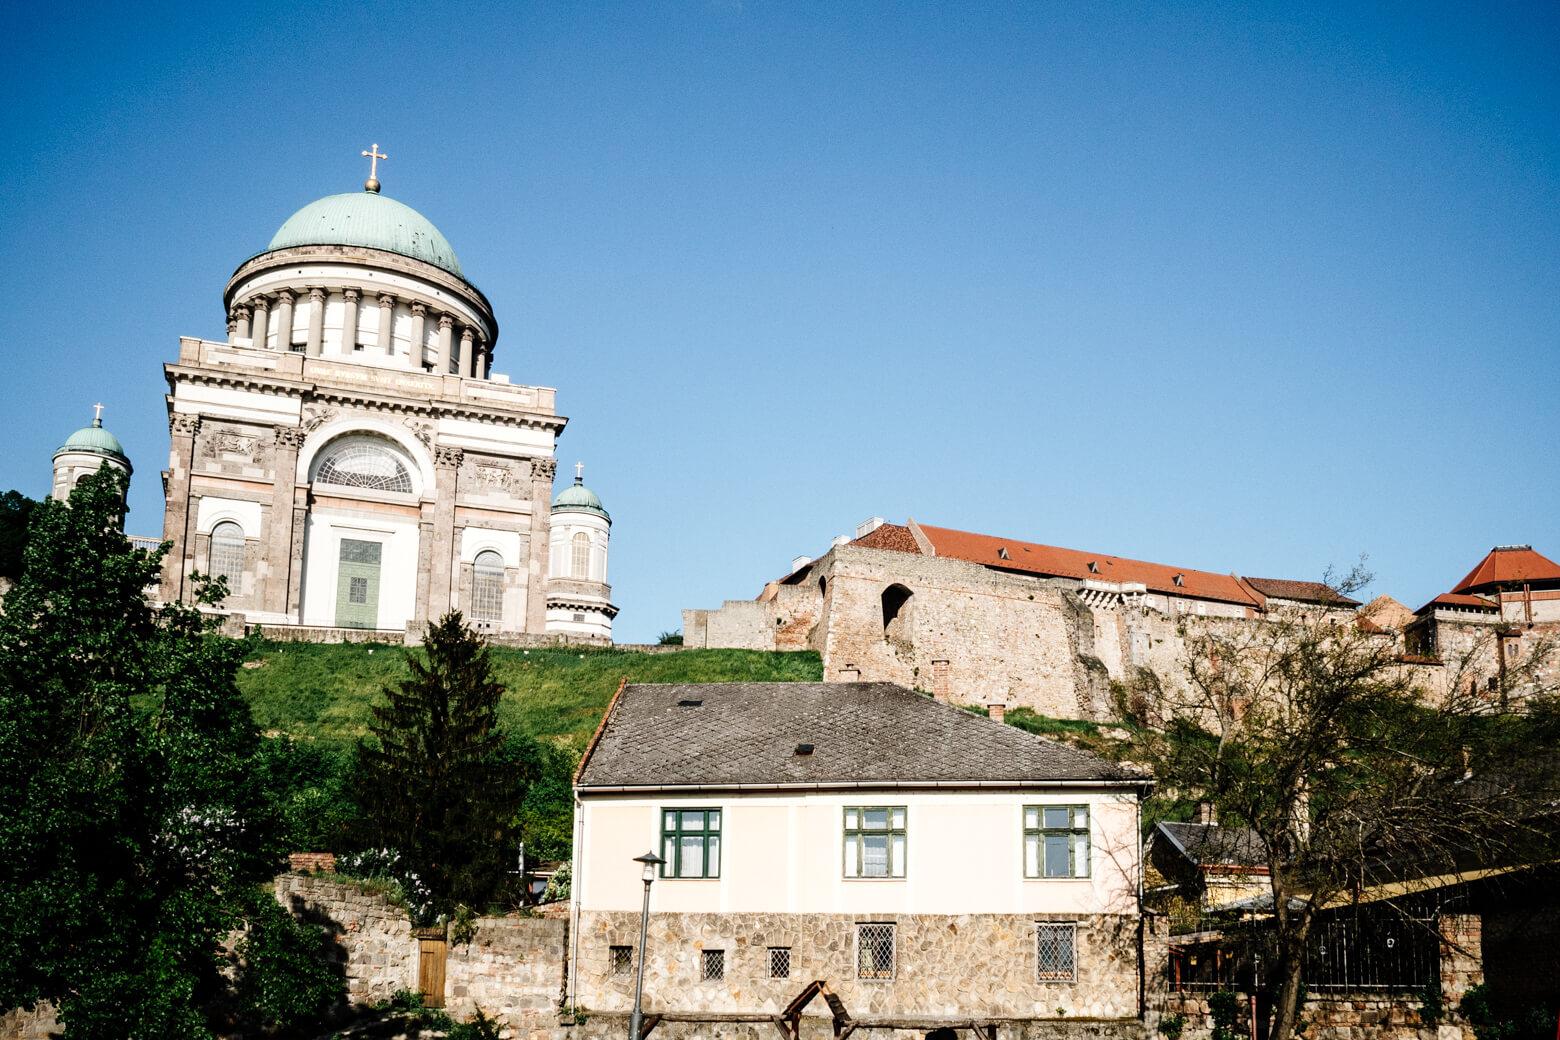 Esztergom Basilica and Castle